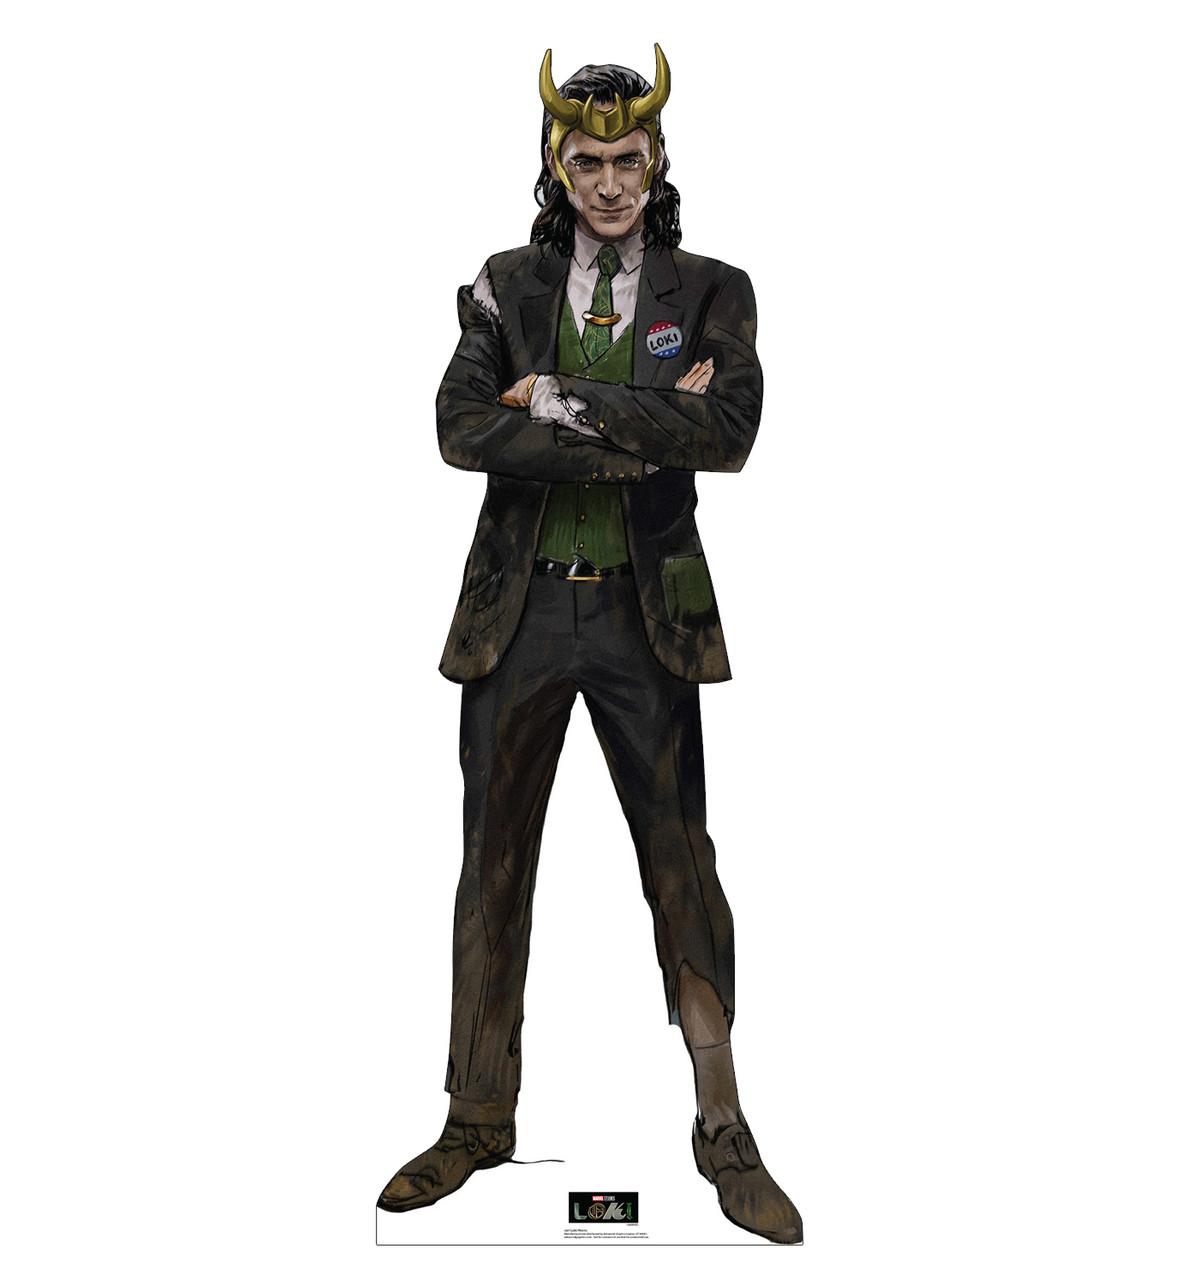 Life-size cardboard standee of Loki Horns from Marvel/Disney+ series Loki.